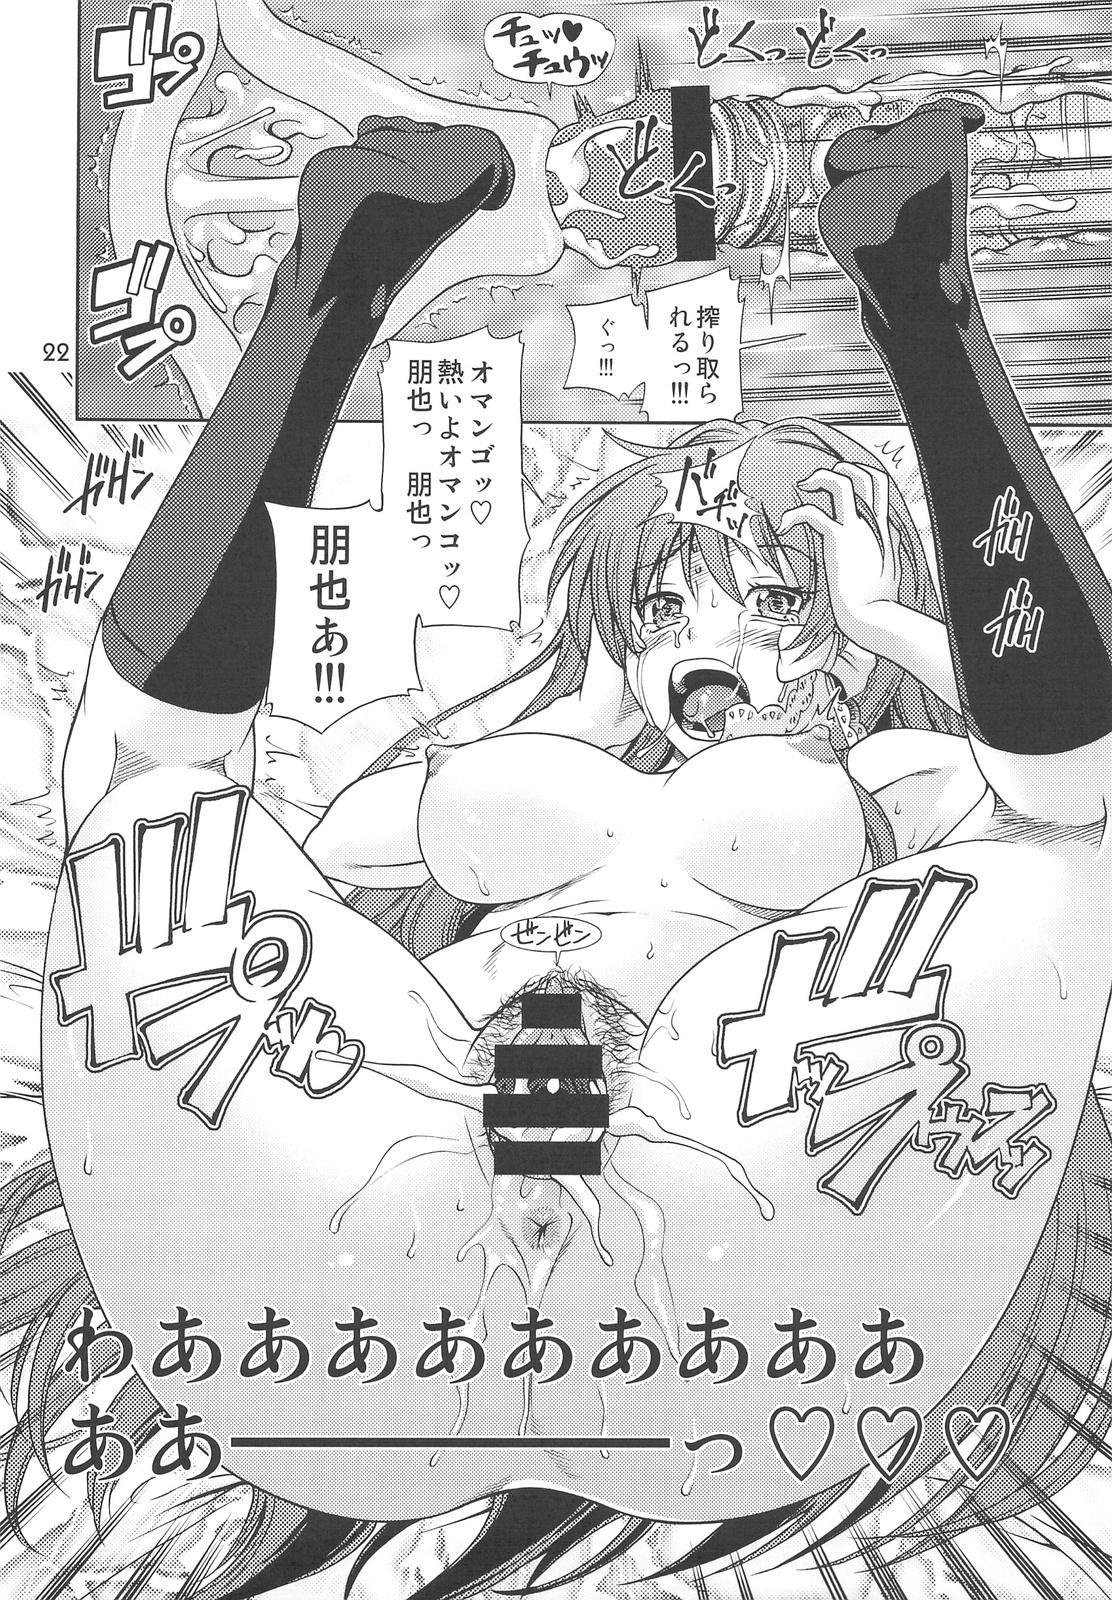 Fujibayashi Nado - Fujibayashi Twins After Story 20